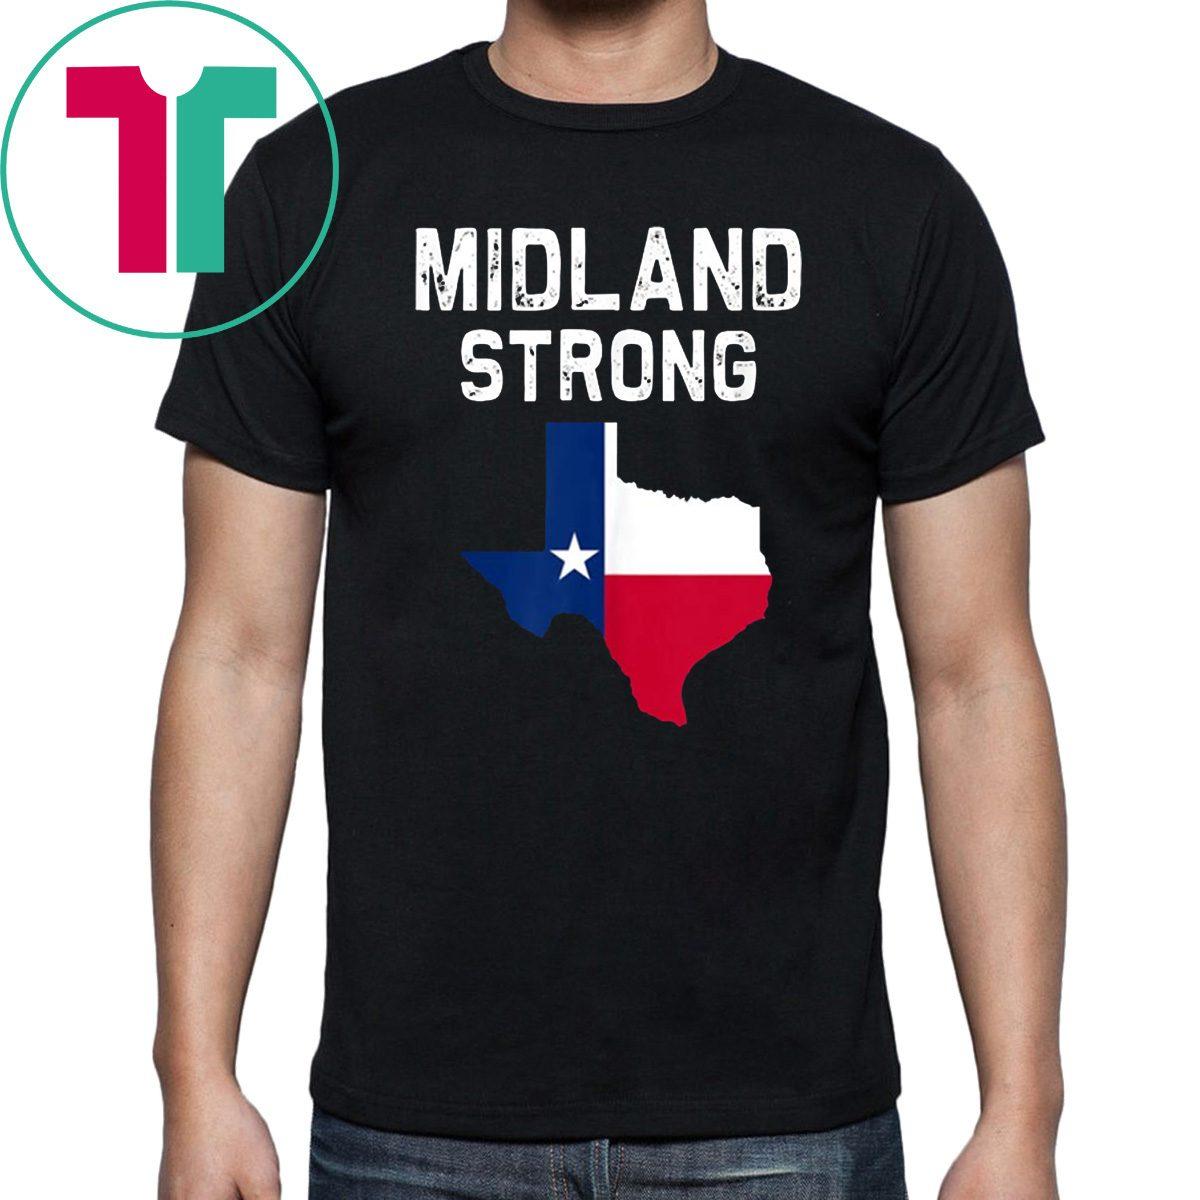 Midland Odessa Strong Texas T-Shirt